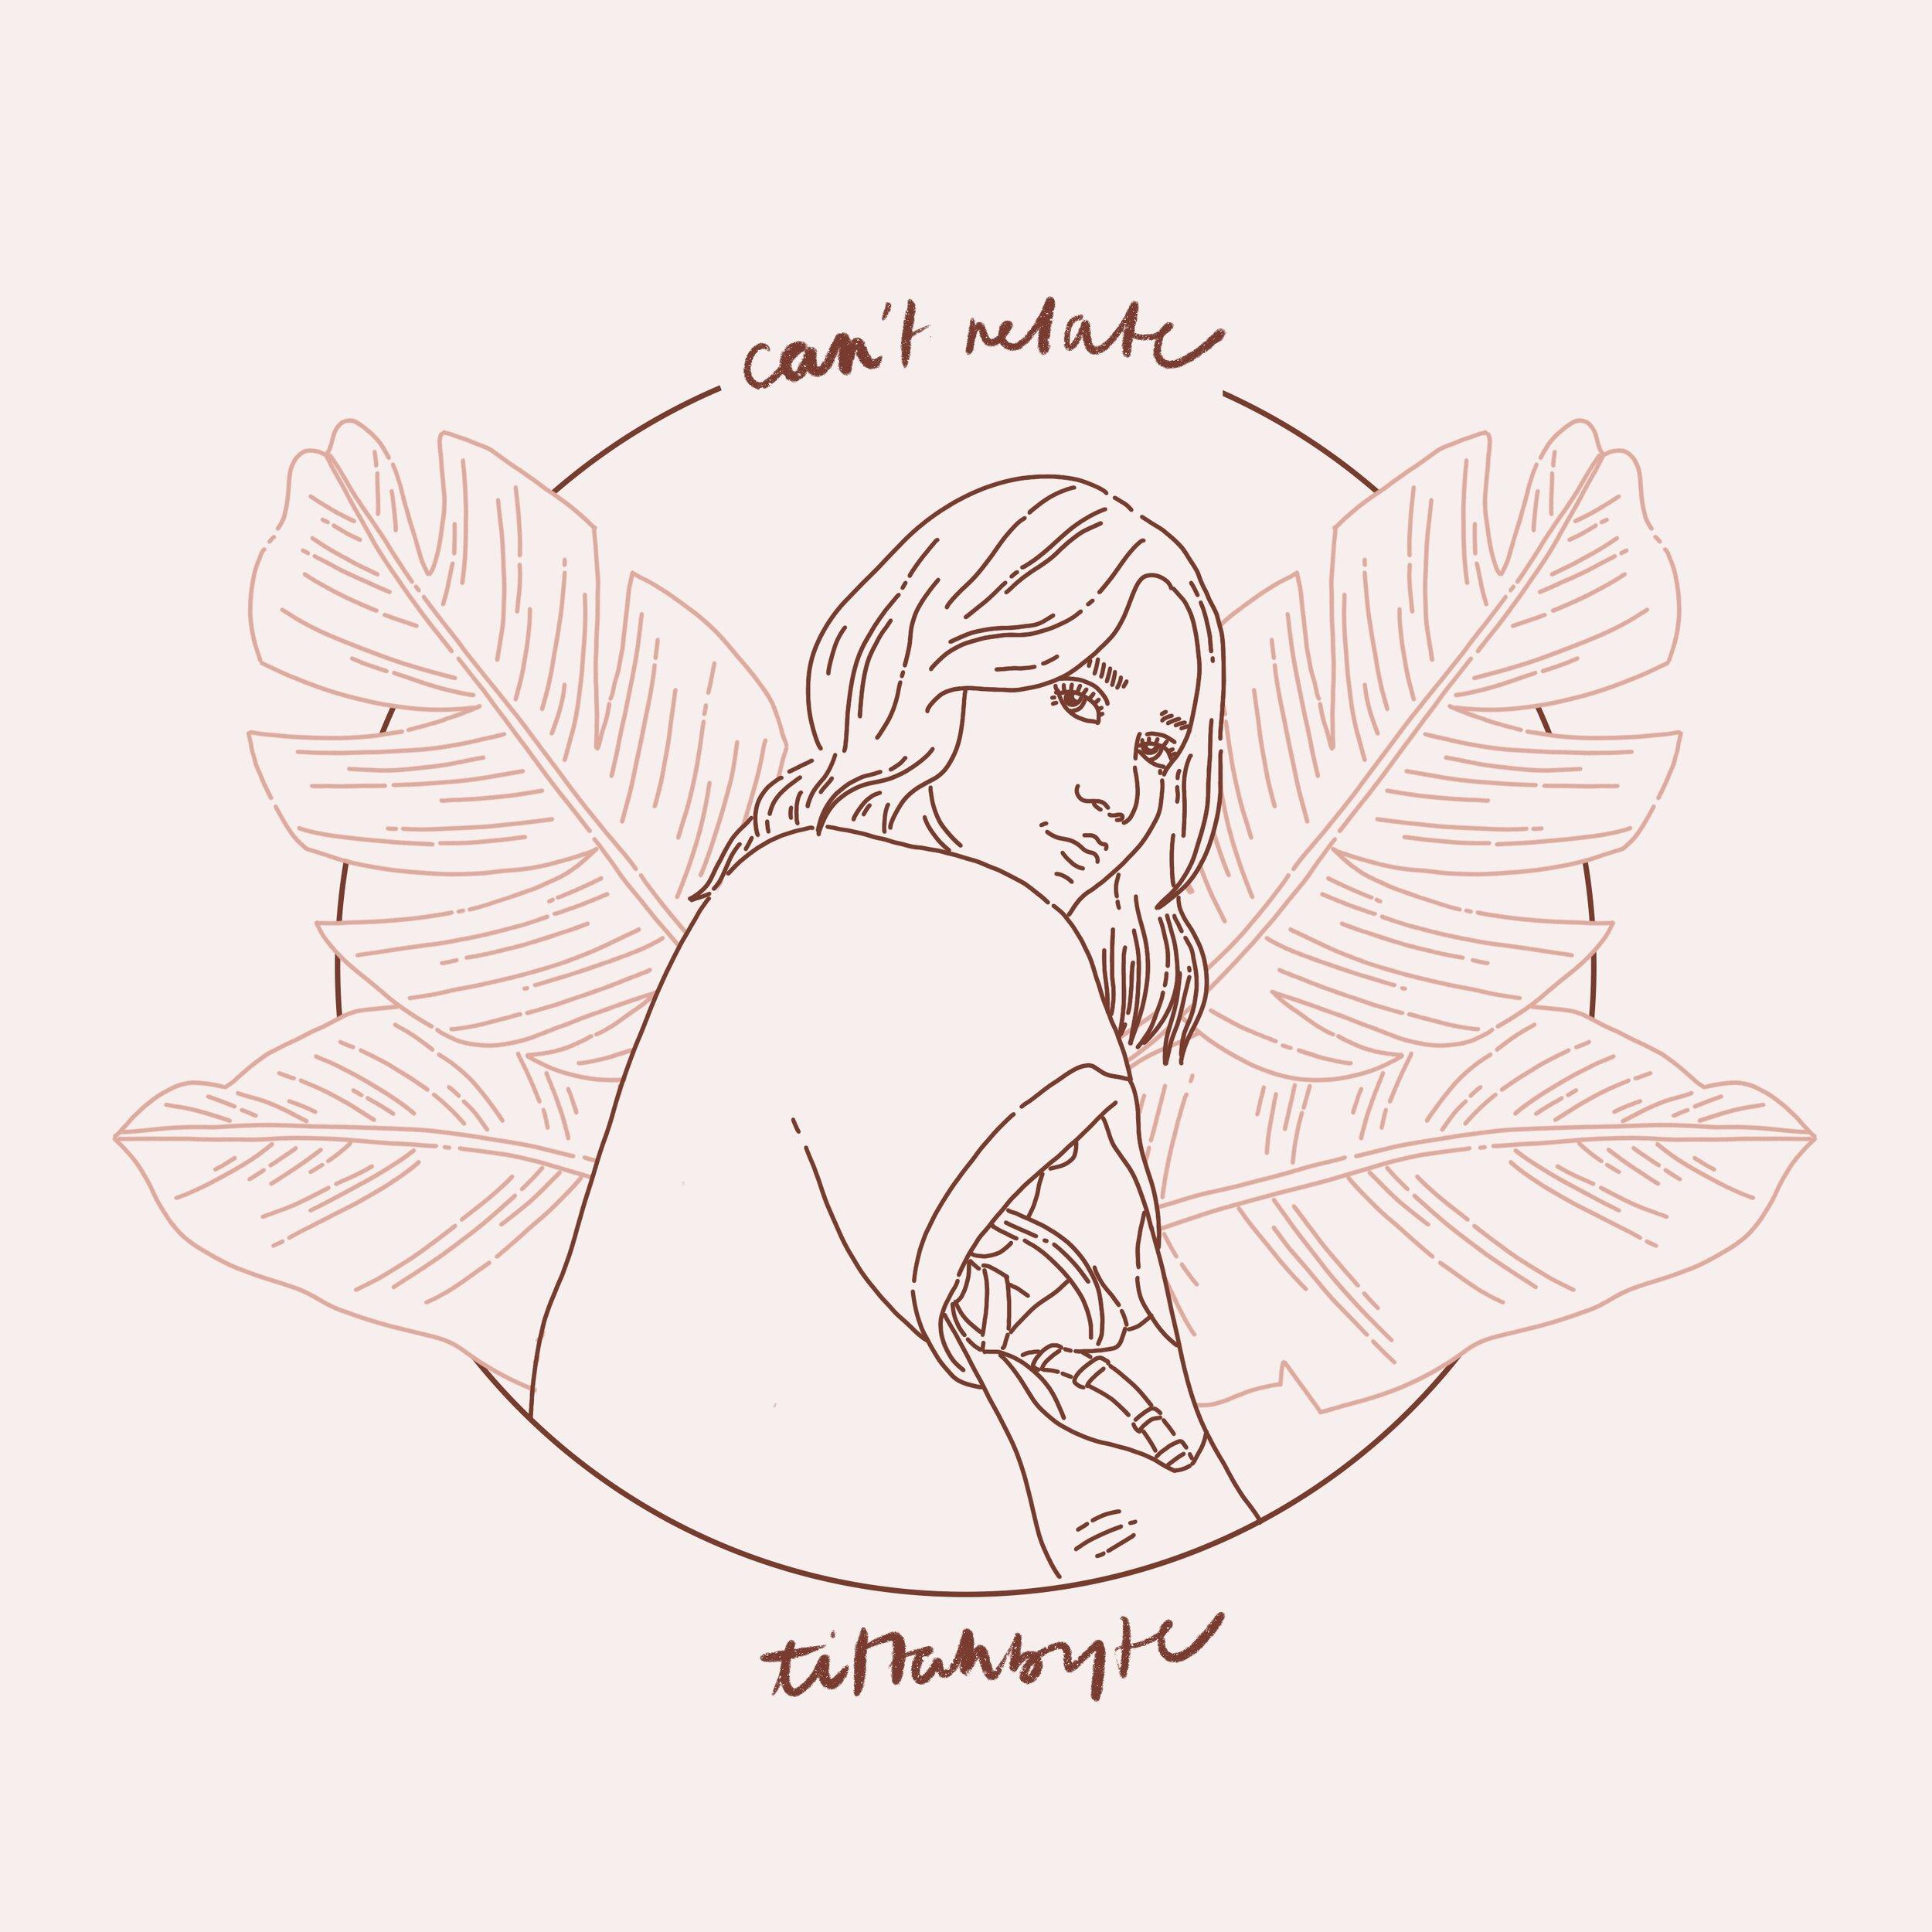 can't relate (2019)  illustration   diane-nicole morada